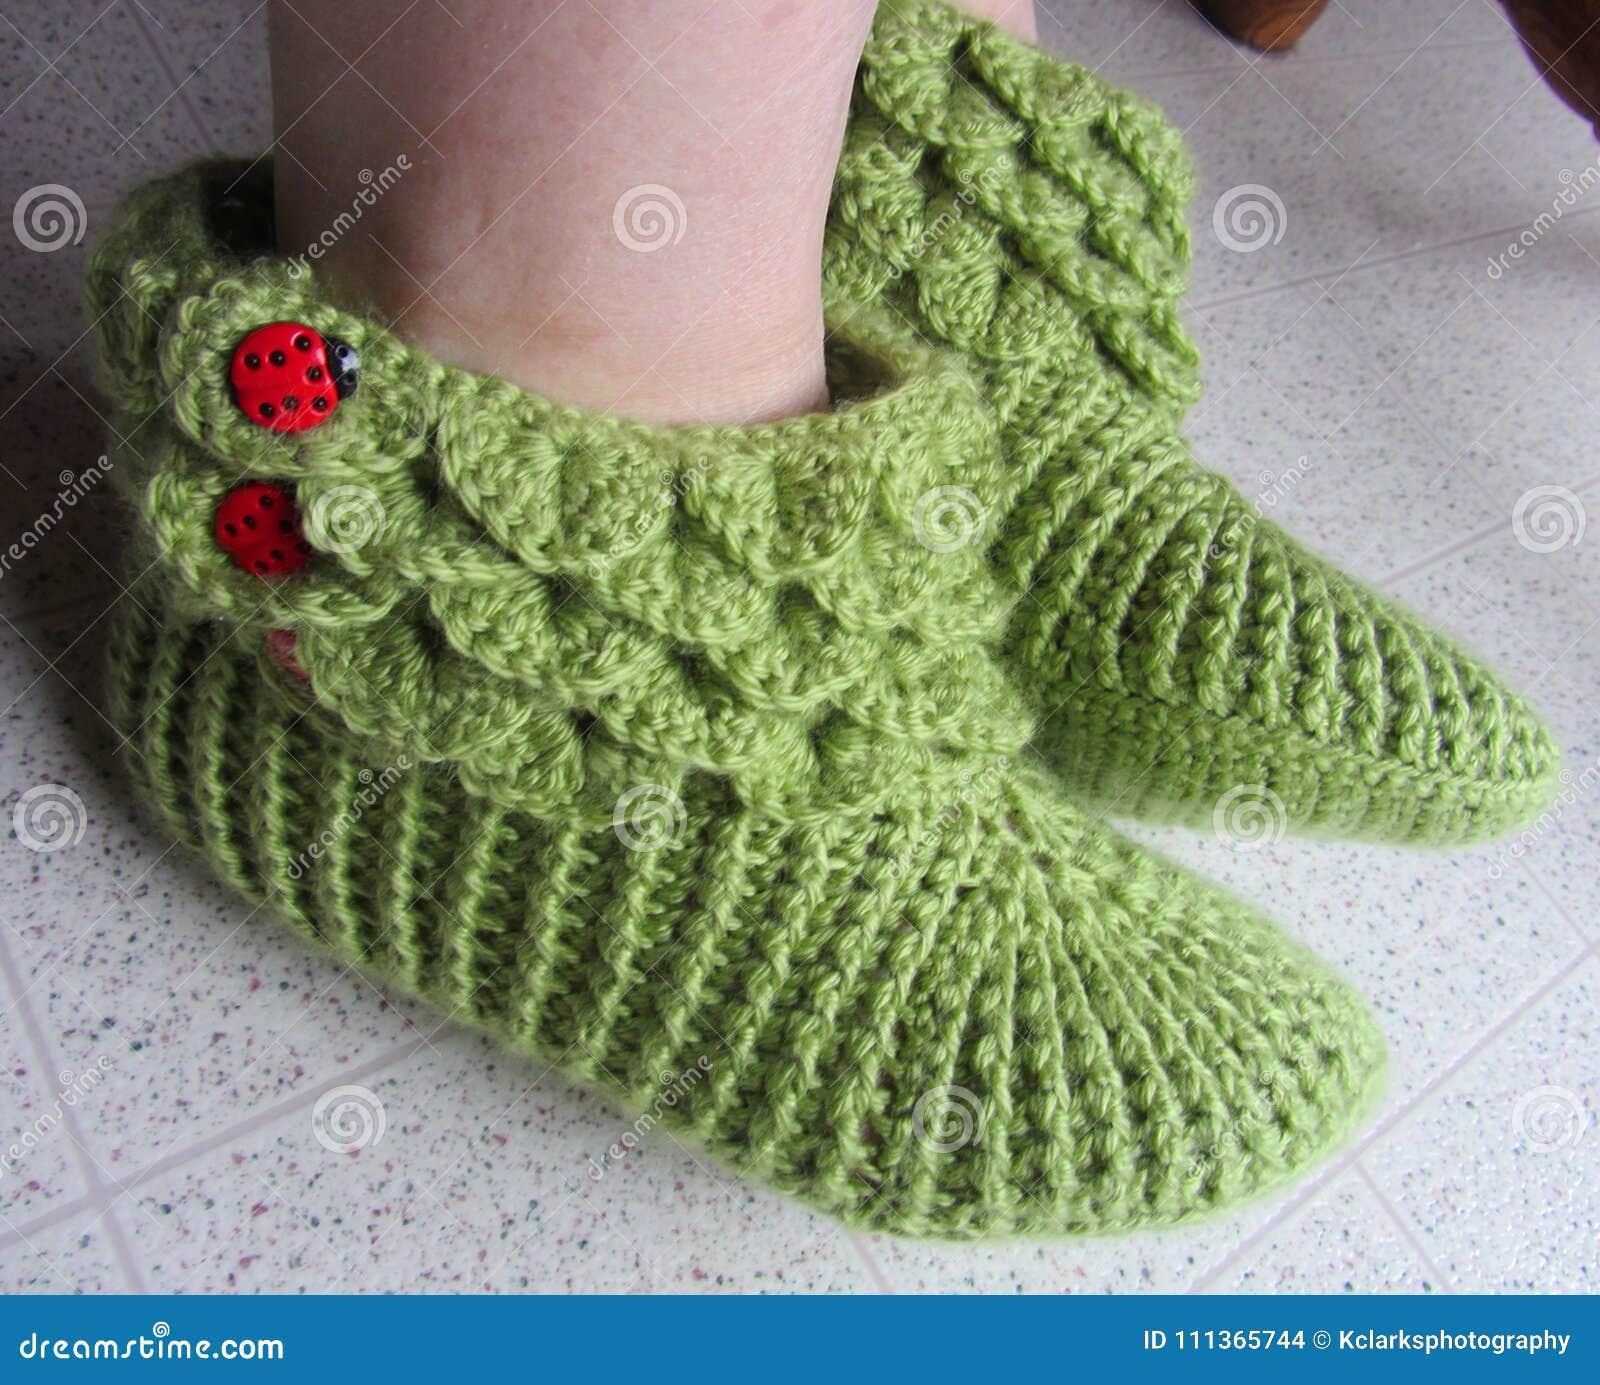 e81ba19a776 Crocodile Stitch Crochet Slippers Lady Bug Buttons Stock Photo ...